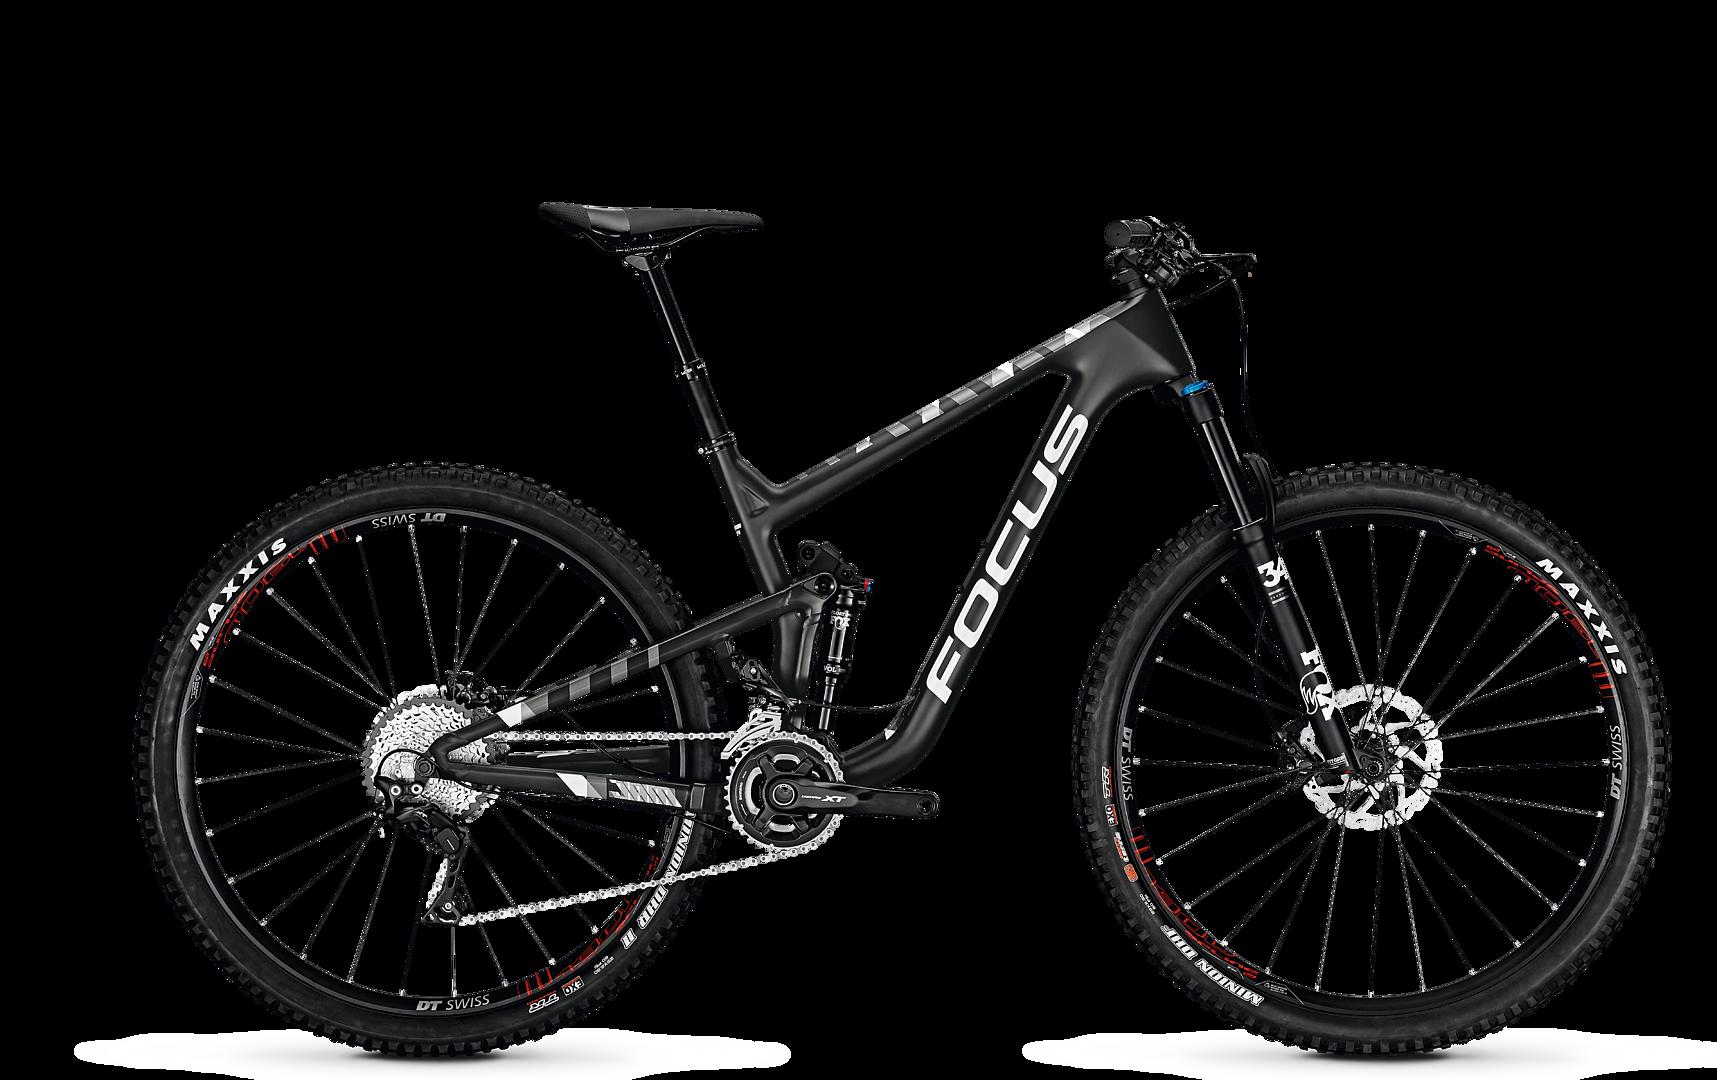 smart performance bikes ride beyond focus bikes. Black Bedroom Furniture Sets. Home Design Ideas